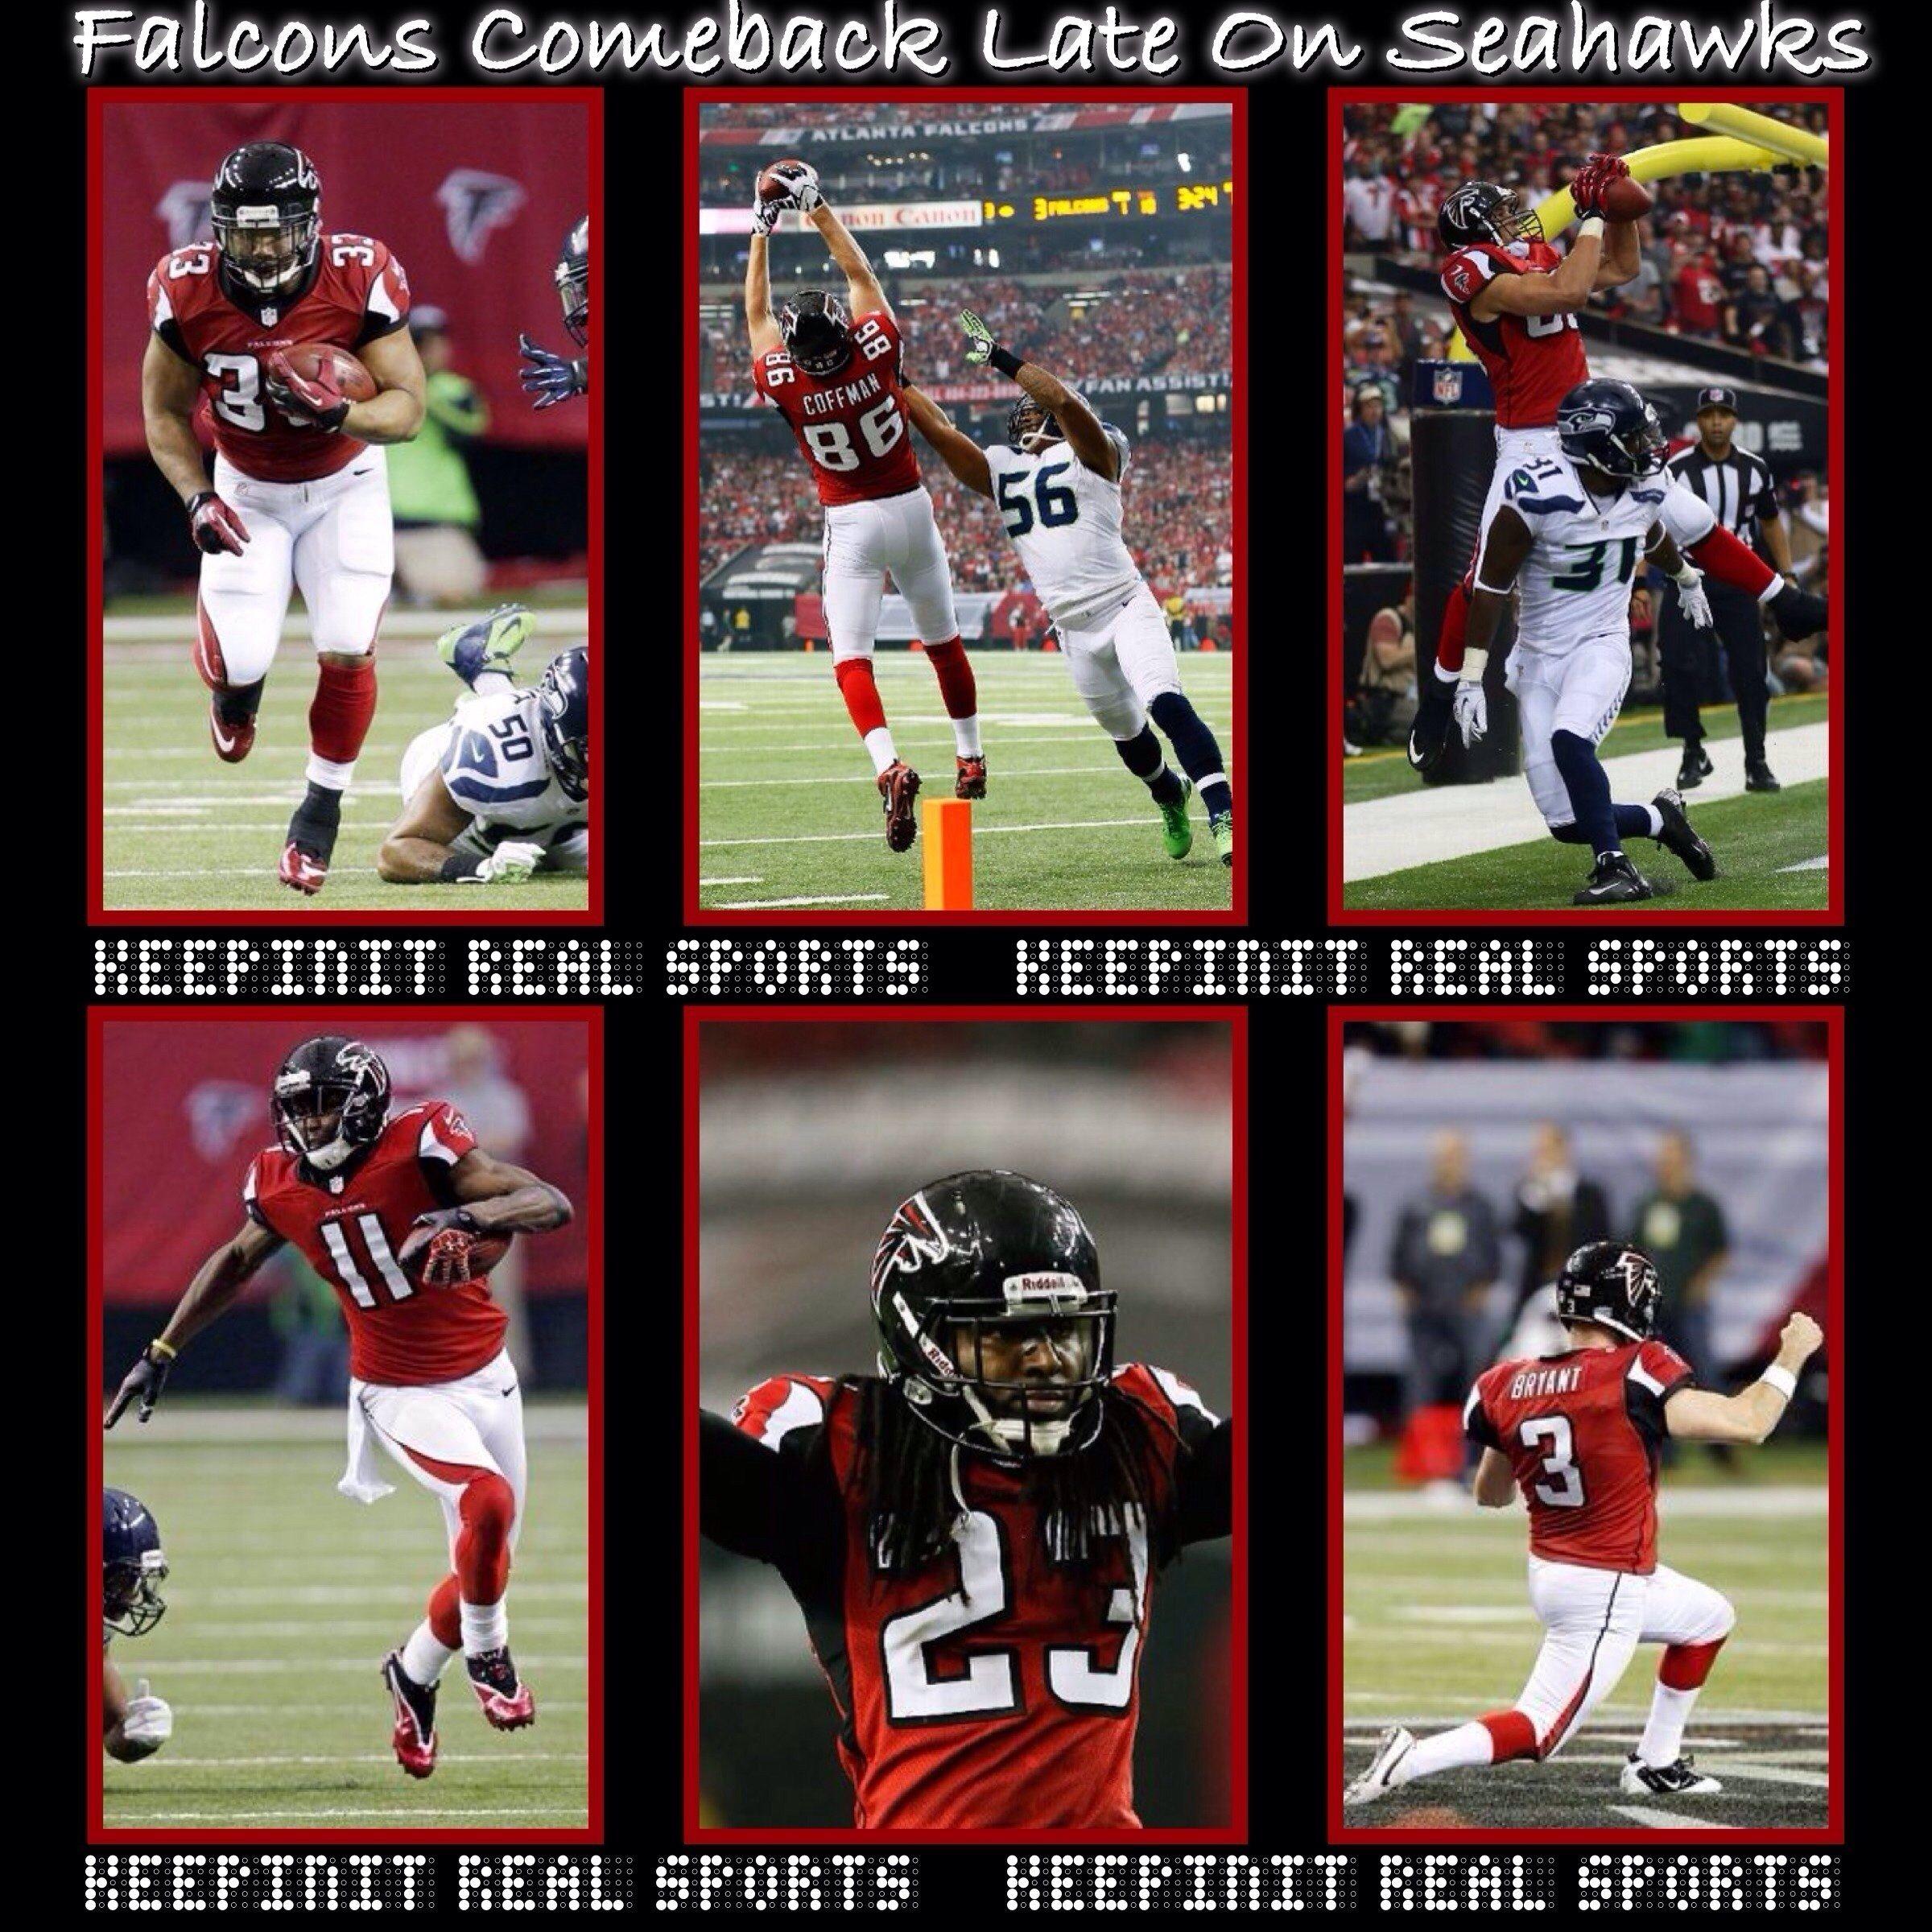 Keepinit Real Nfl Stats Seahawks Vs Falcons Seahawks 28 11 5 3 5 Away Falcons 30 13 3 7 1 Home Final Top Performers Pas Nfl Stats Seahawks Falcons